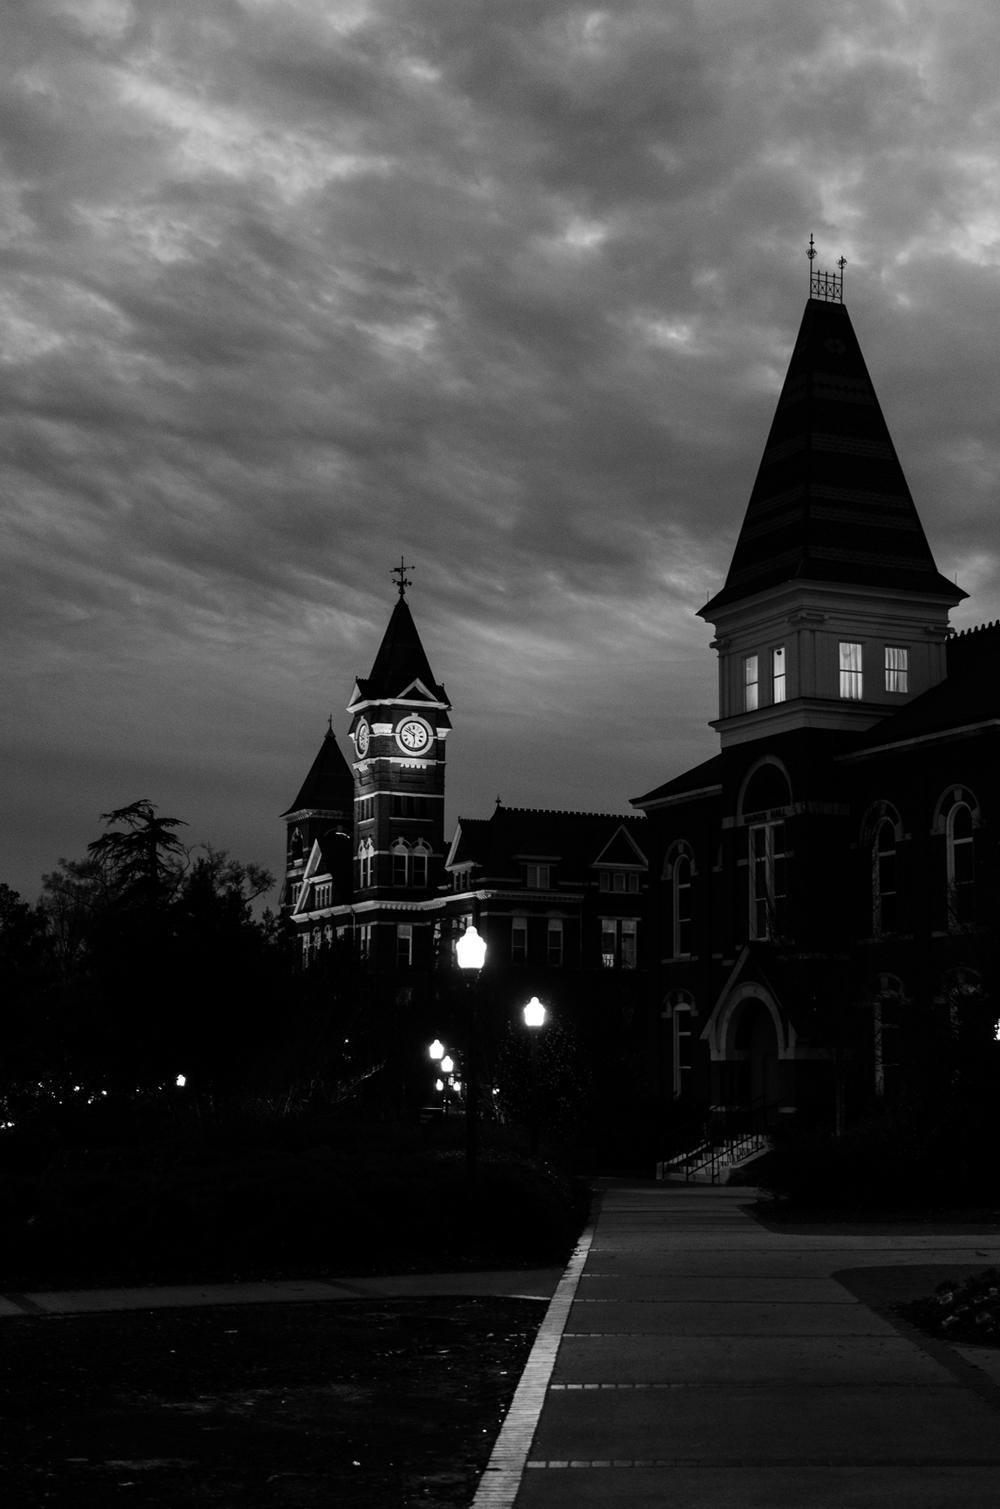 Project 365: #55 - Auburn